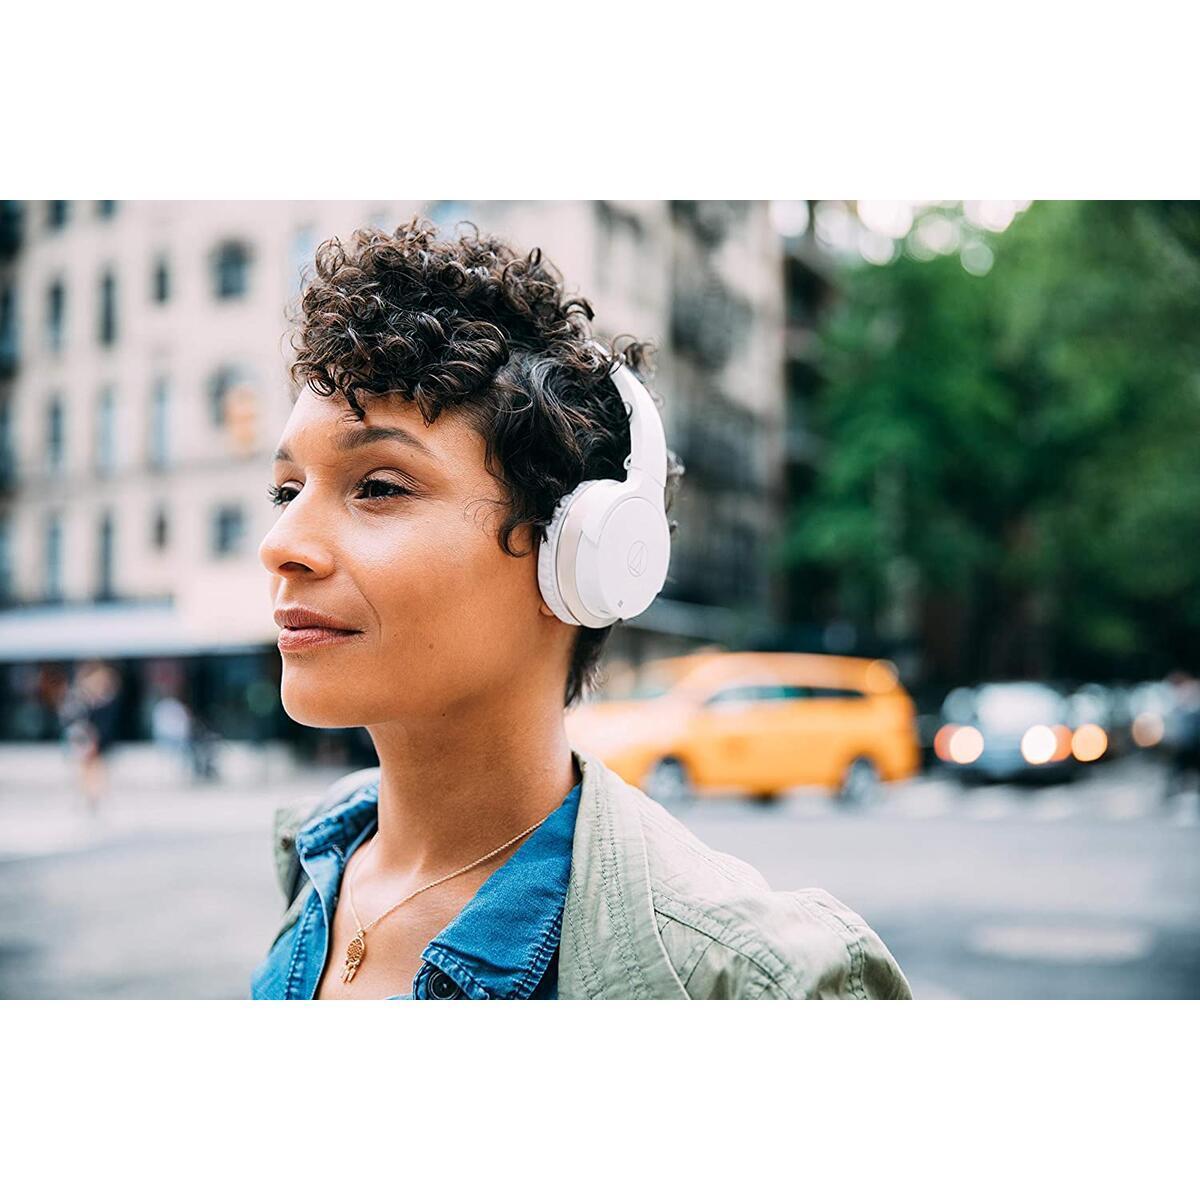 Audio-Technica ATH-AR3BTWH SonicFuel Bluetooth Wireless On-Ear Headphones with Mic & Control, White